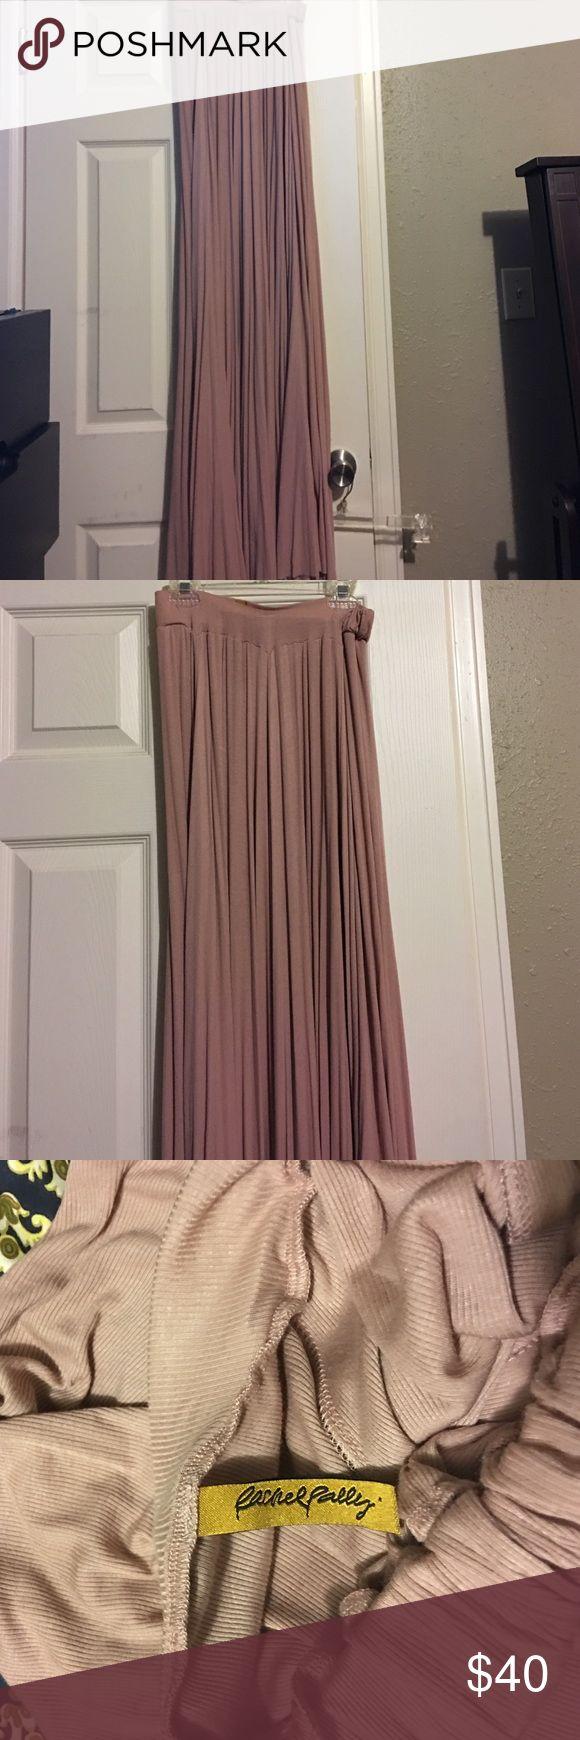 Rachel Pally Maxi Skirt NWOT ribbed maxi skirt. Color is like a rose/mauve very cute. Rachel Pally Skirts Maxi